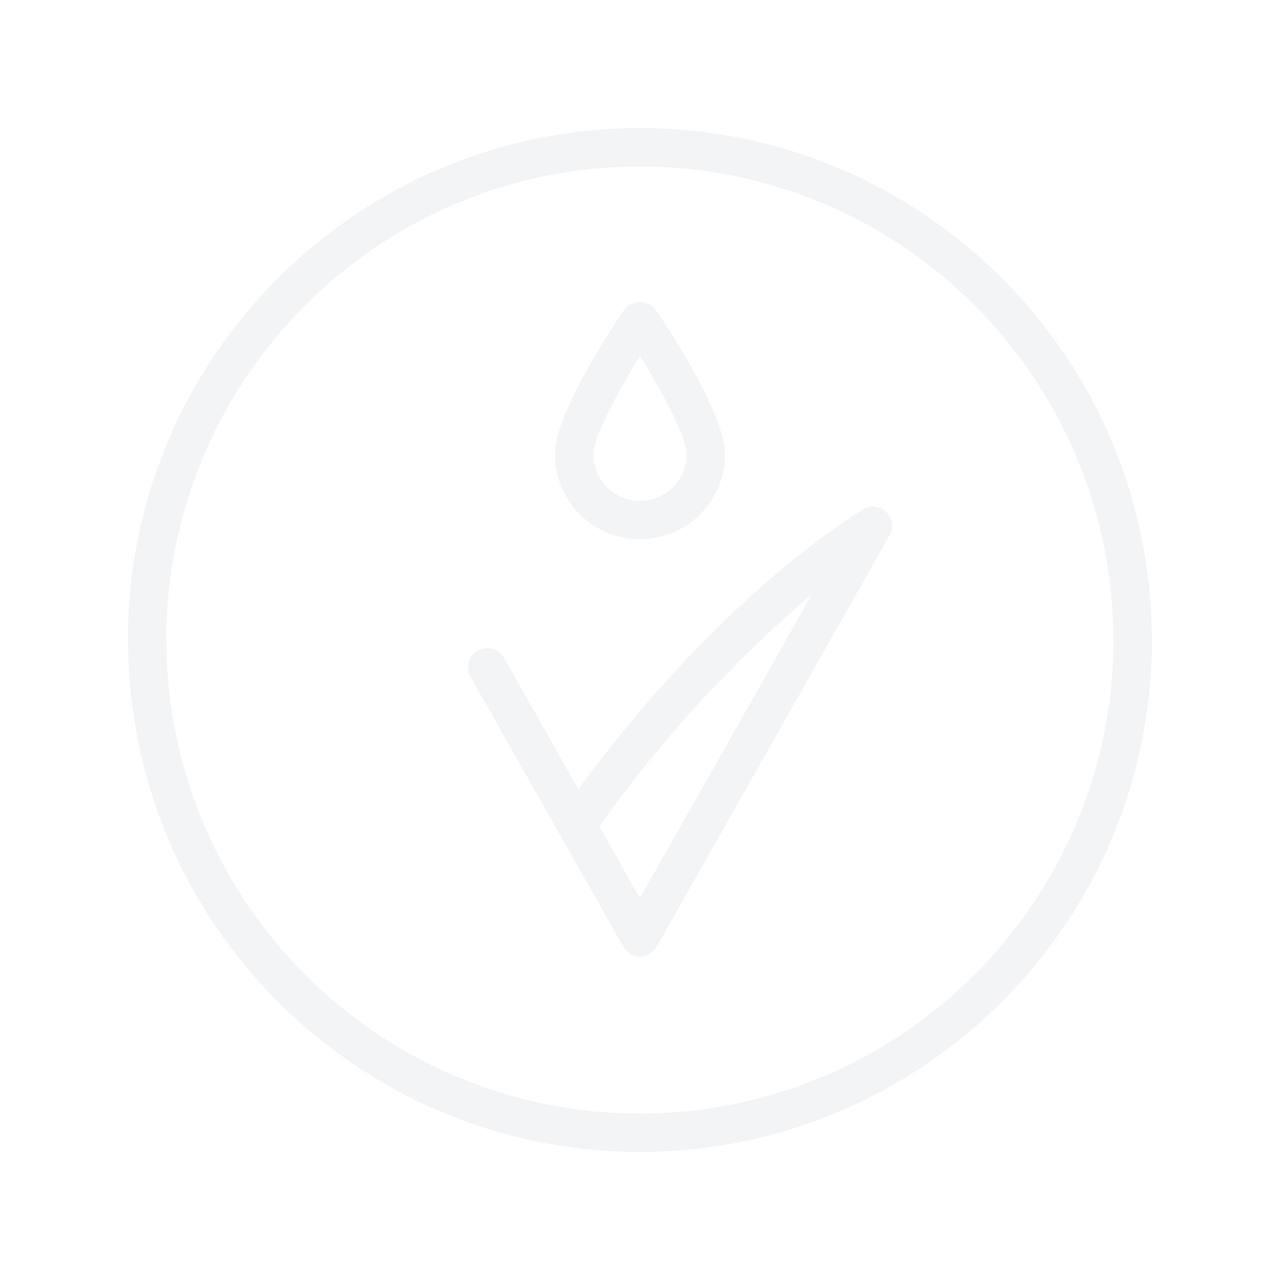 LOTTIE Arch Rival Brow Artist Pencil 0.05g